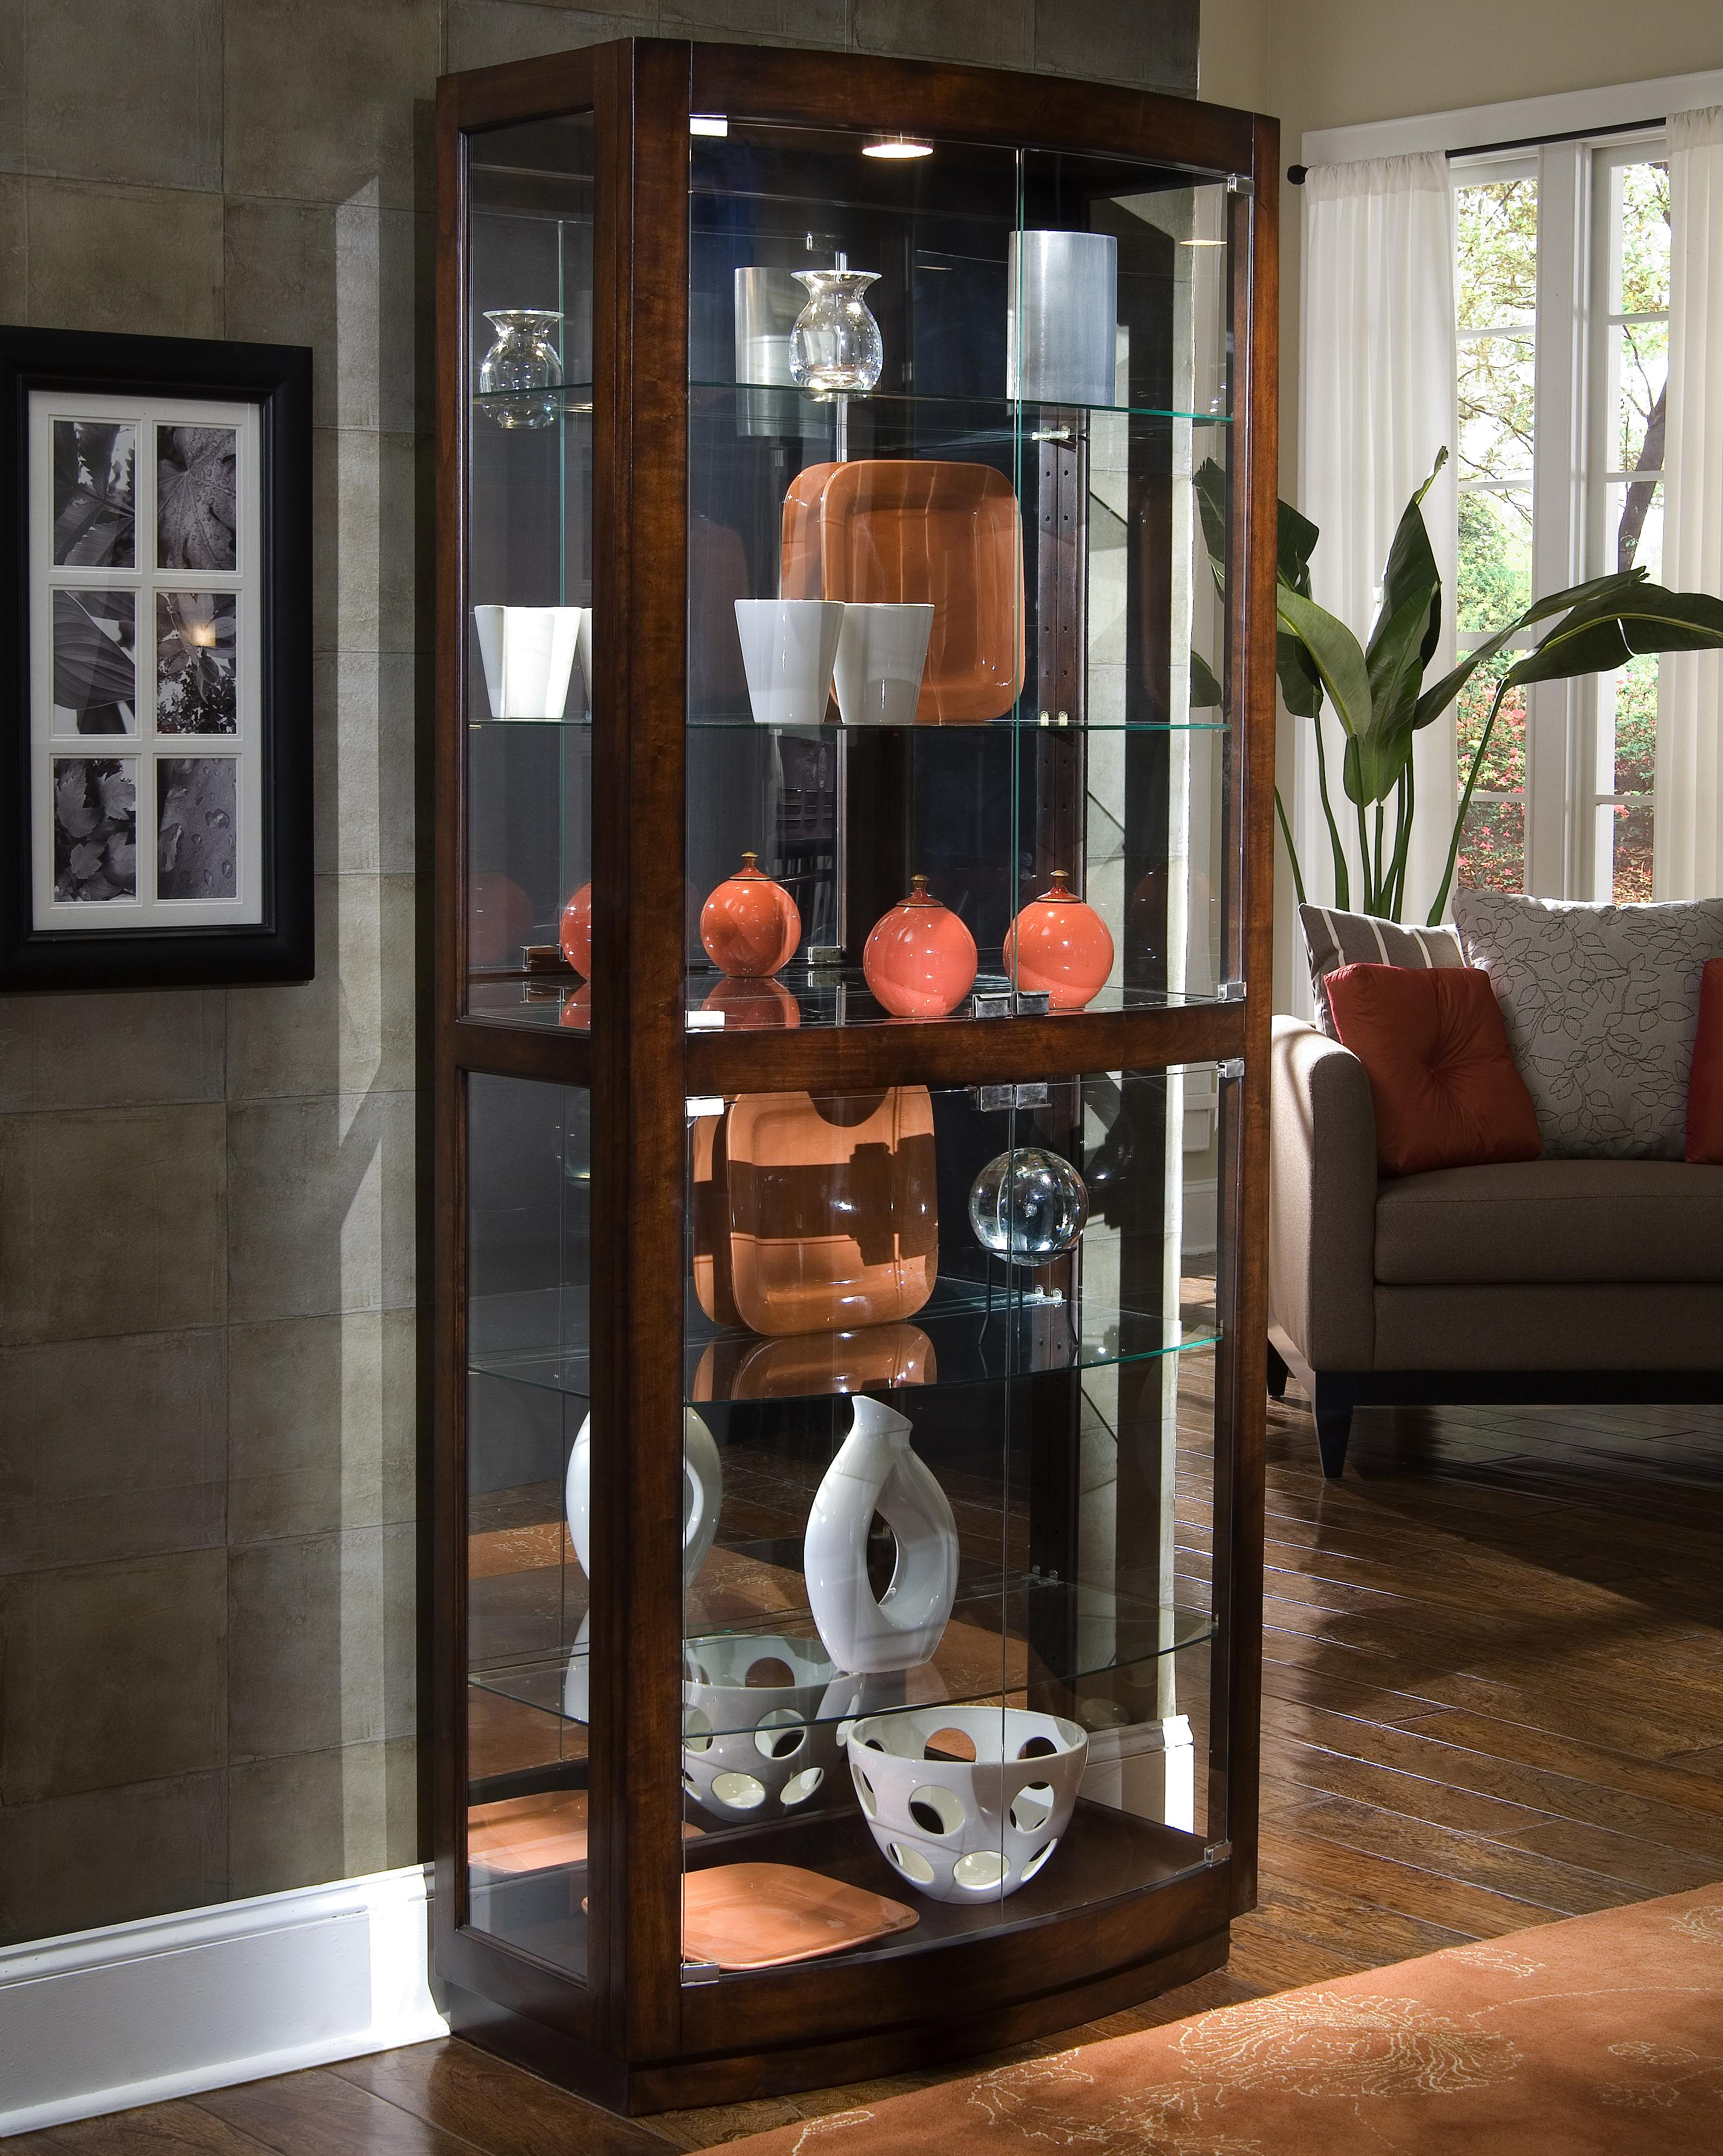 Pulaski Furniture Curios Pacific Heights Curio Cabinet - AHFA ...